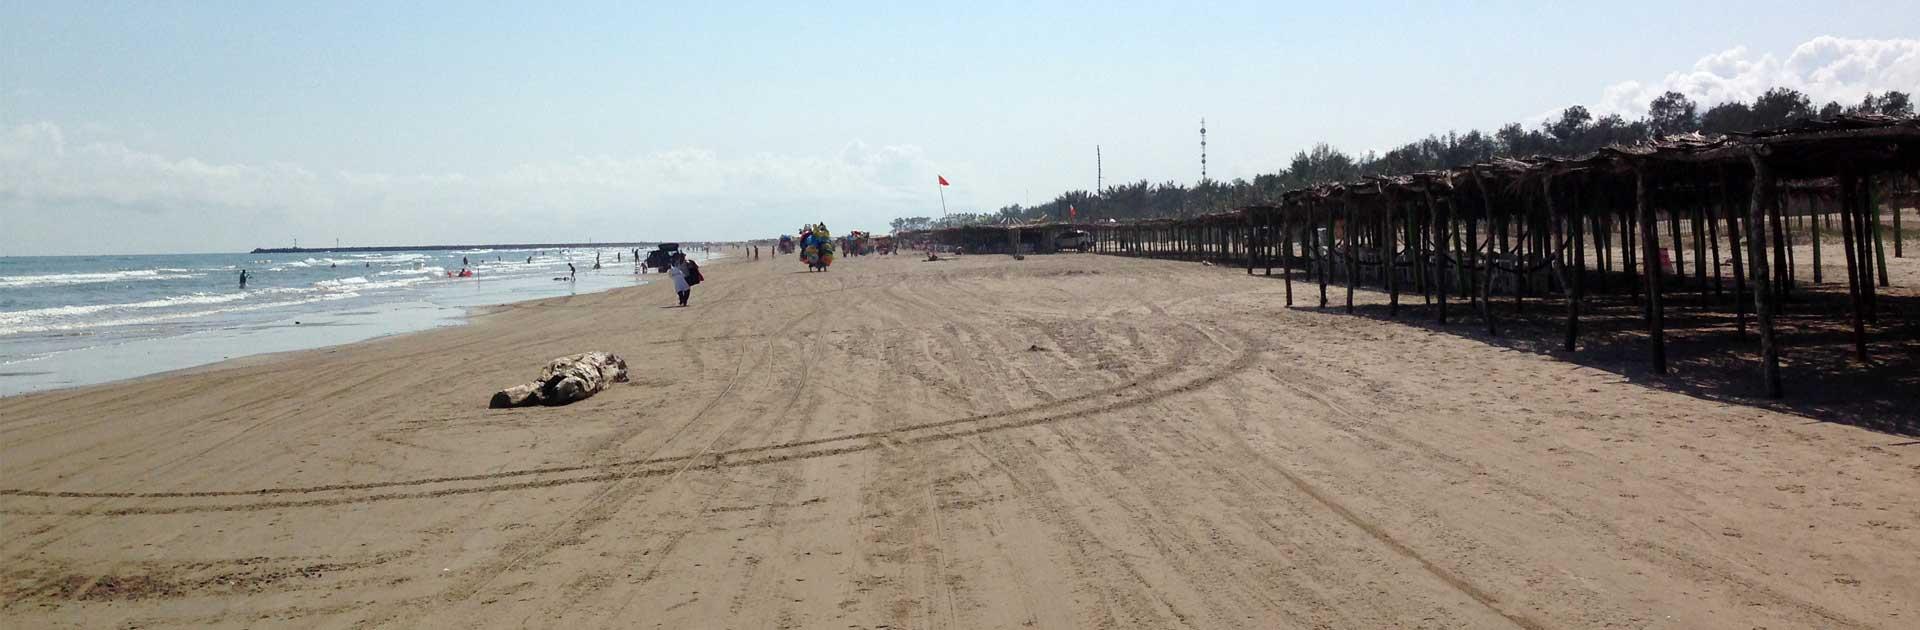 Playas de Tuxpan, Veracruz